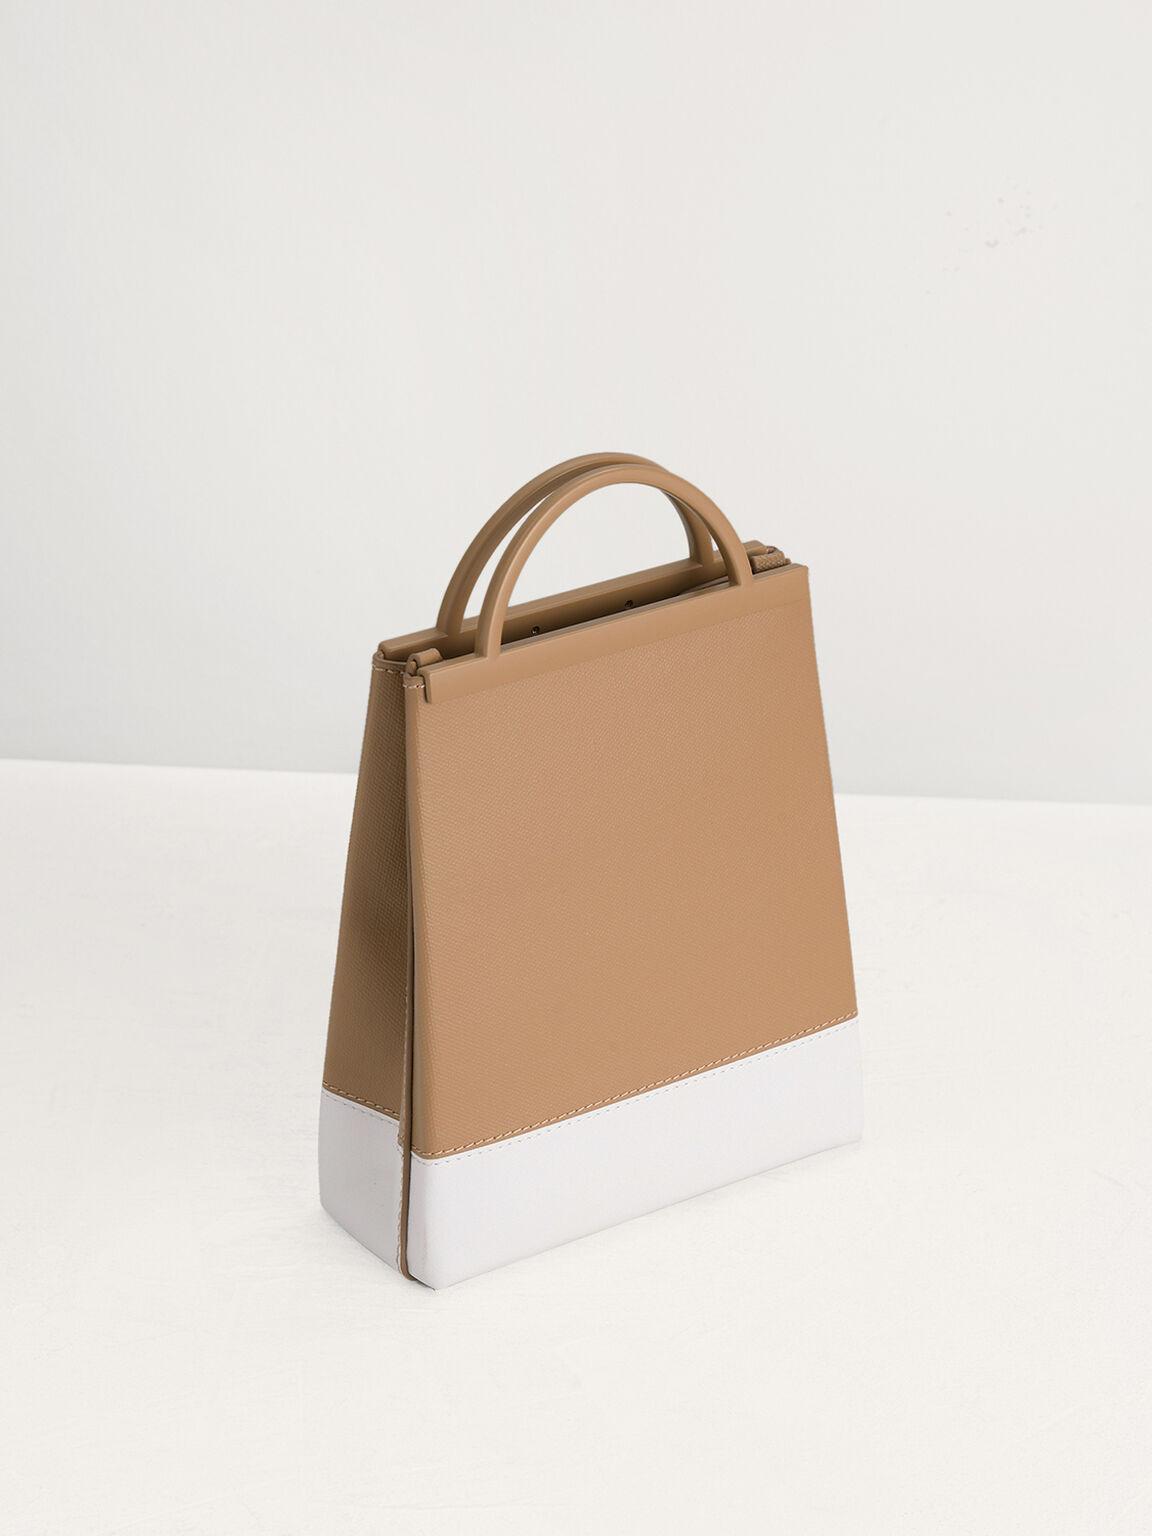 Sustainable Mini Shopper Tote, Camel, hi-res